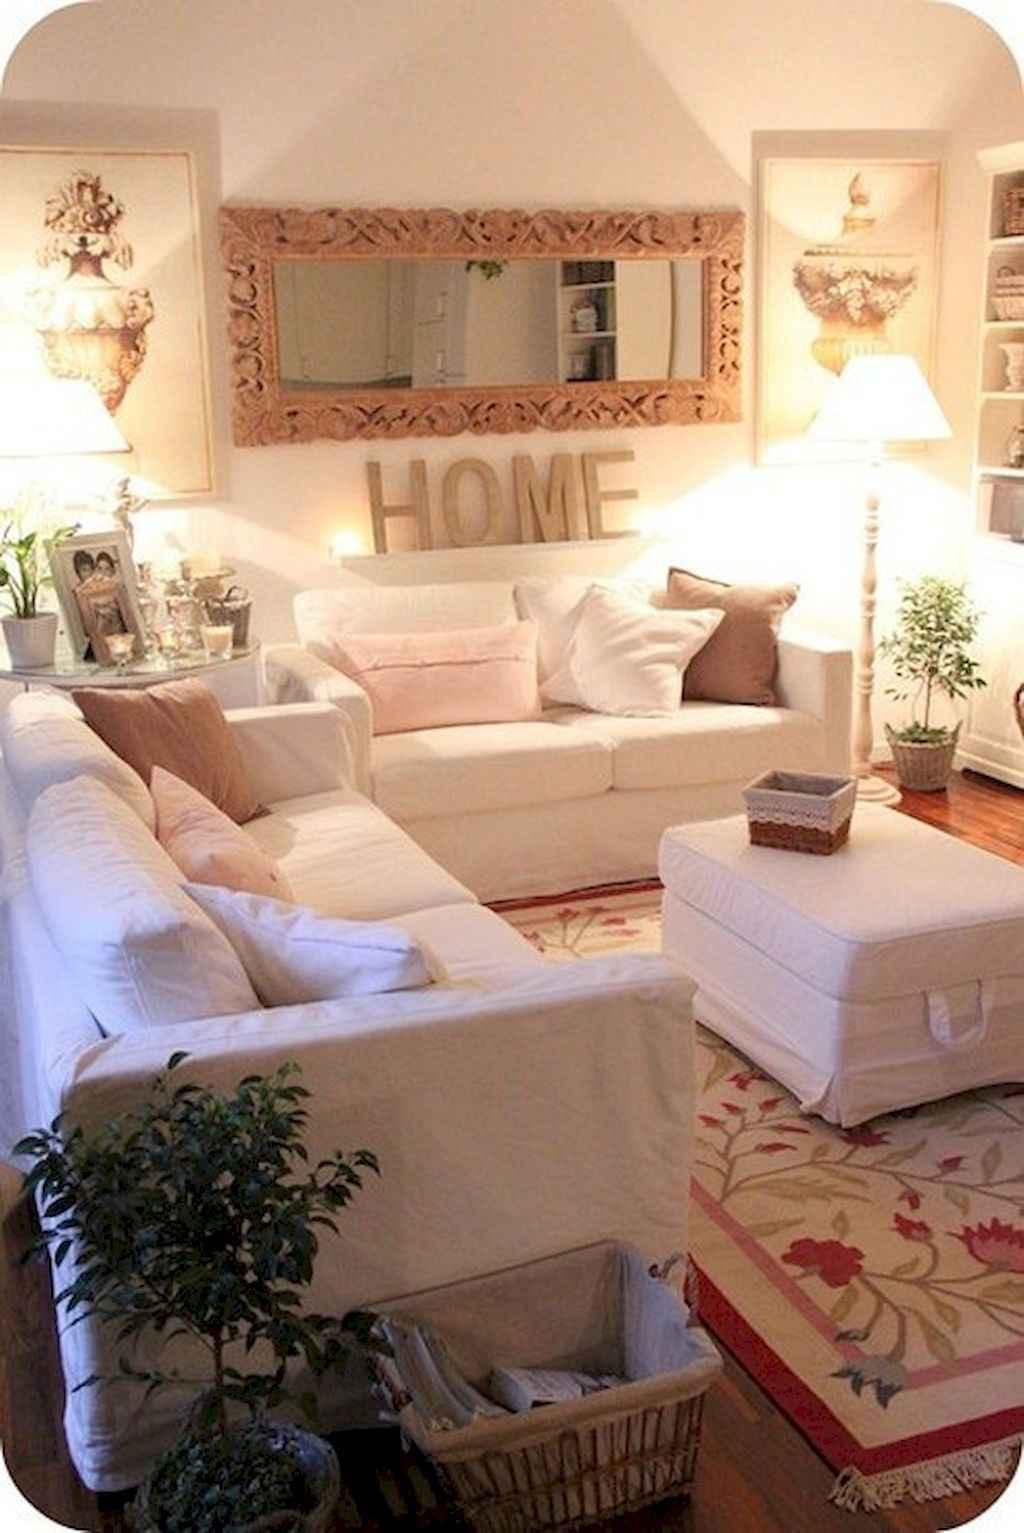 Small apartment decorating ideas (68)